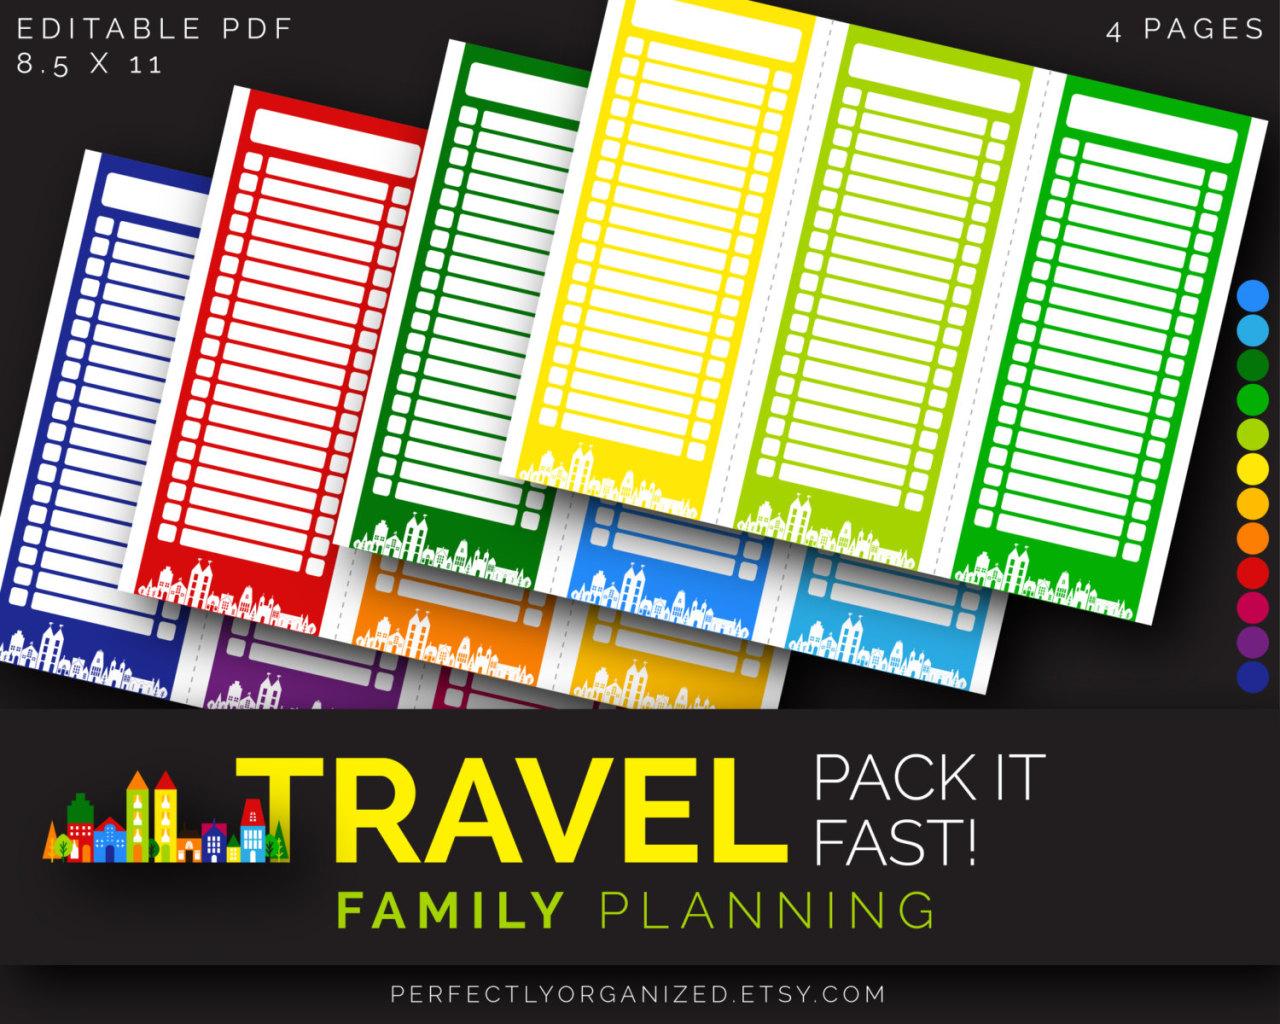 Perfectly Organized Life